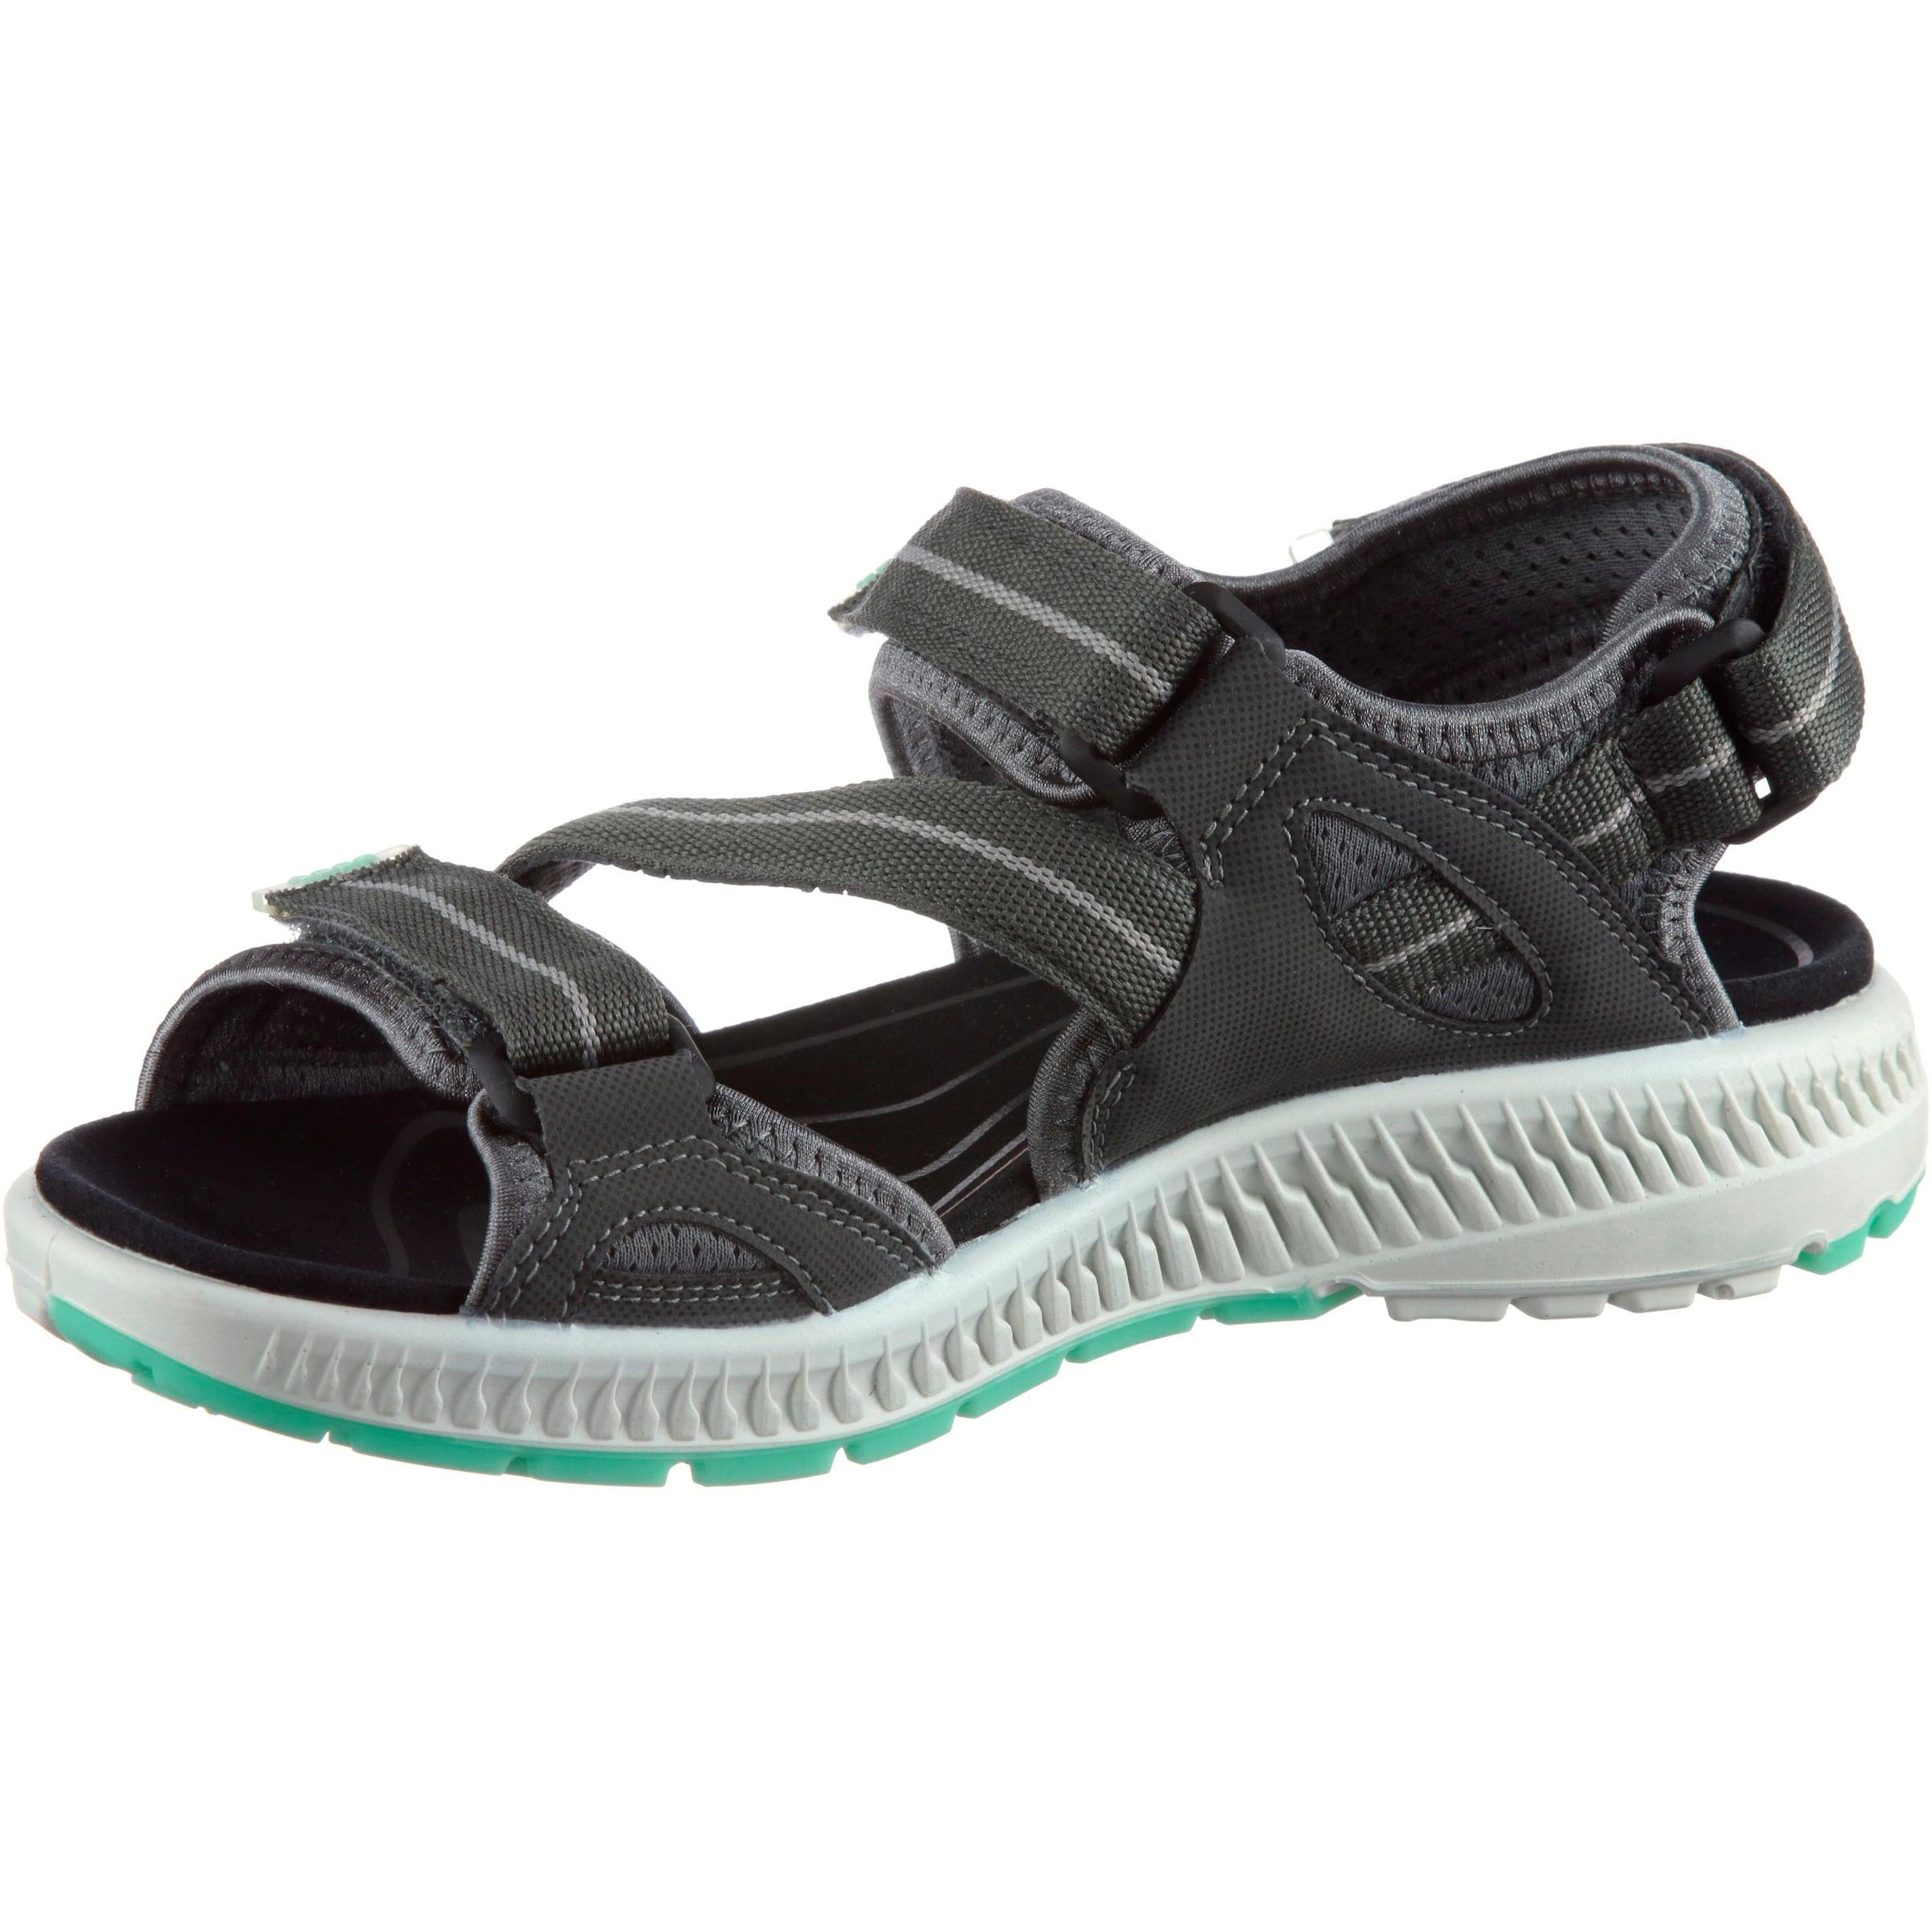 ECCO Terra Sandal Sandalen Verschleißfeste billige Schuhe